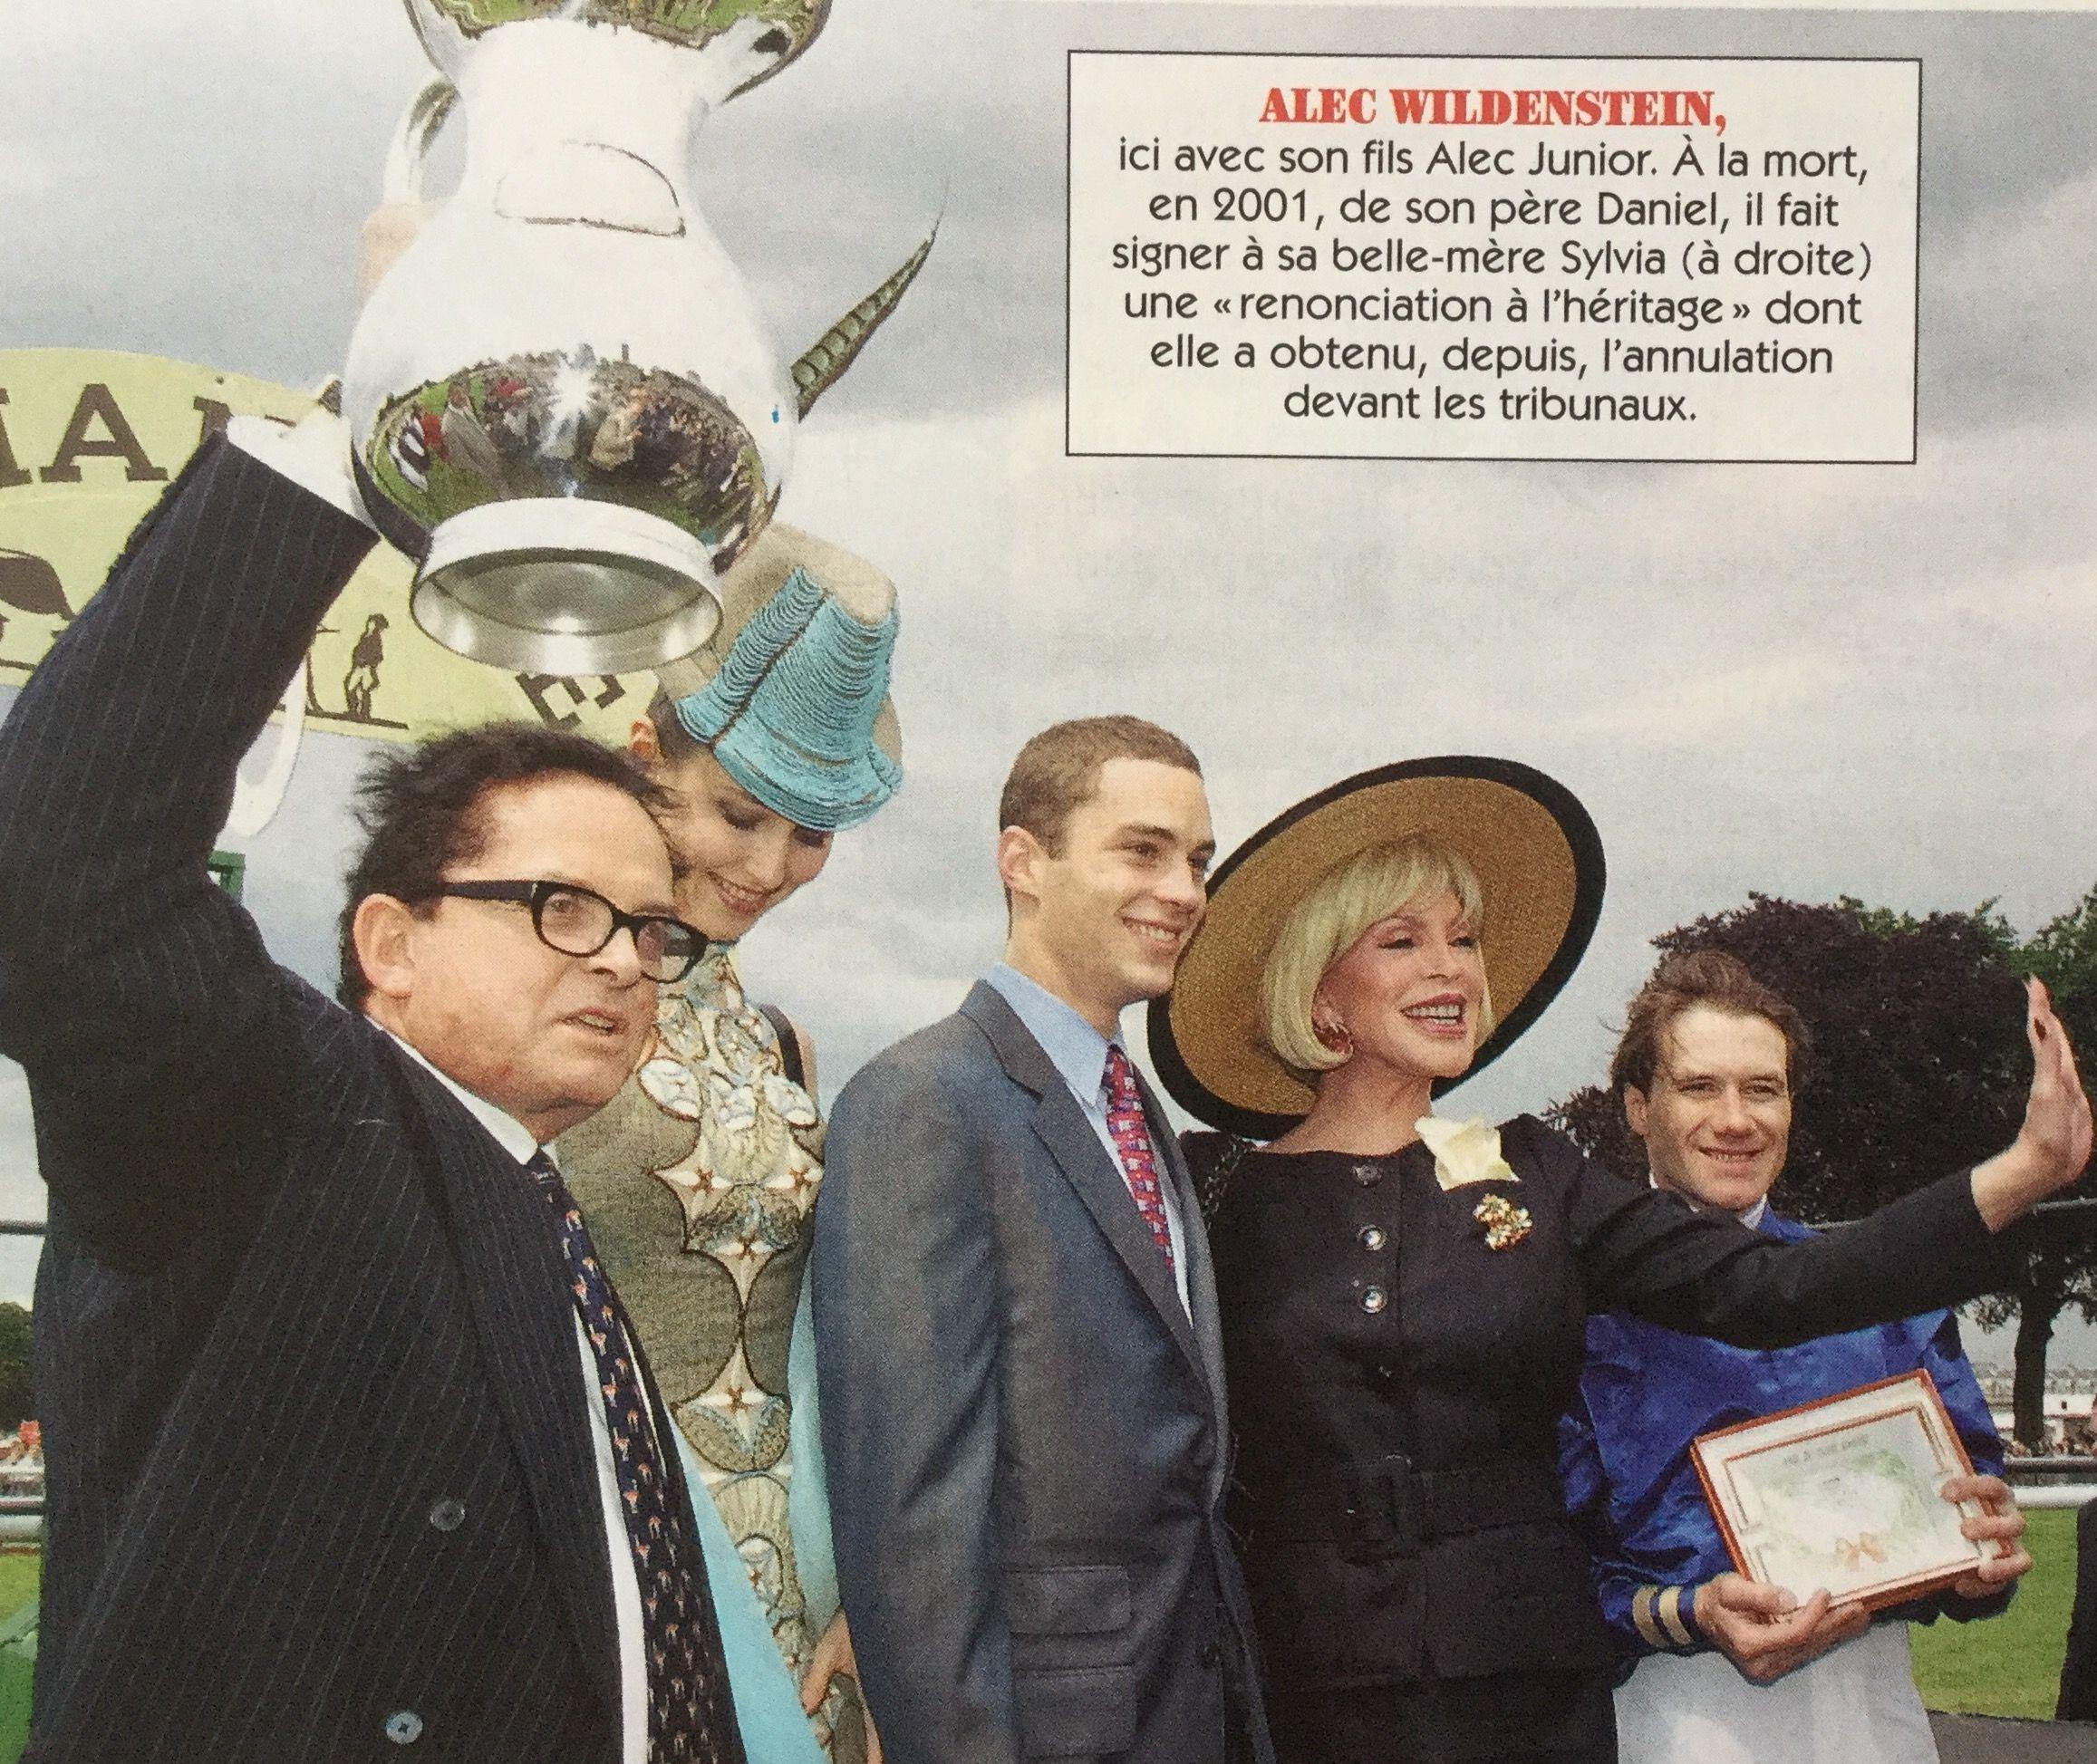 Alec Wildenstein Russian Model